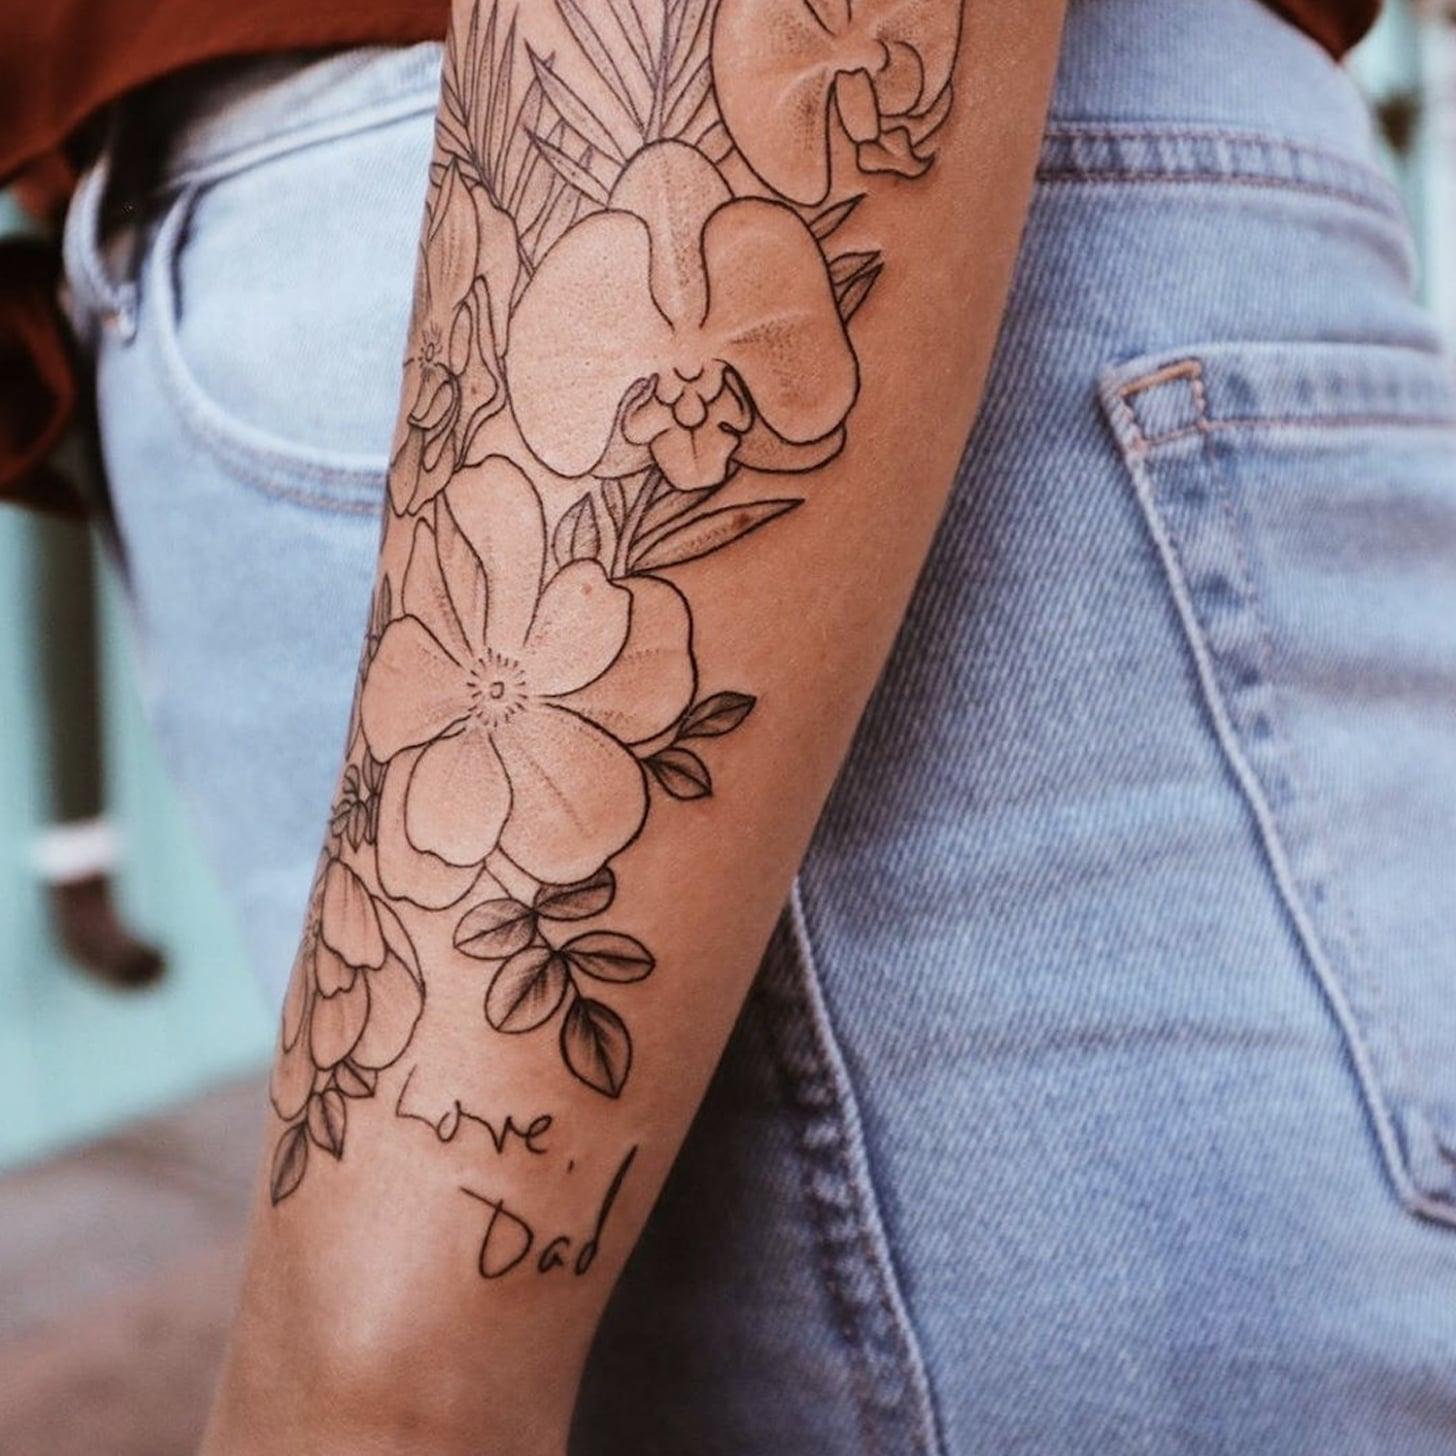 The Best Memorial Tattoo Ideas 2020 Popsugar Beauty